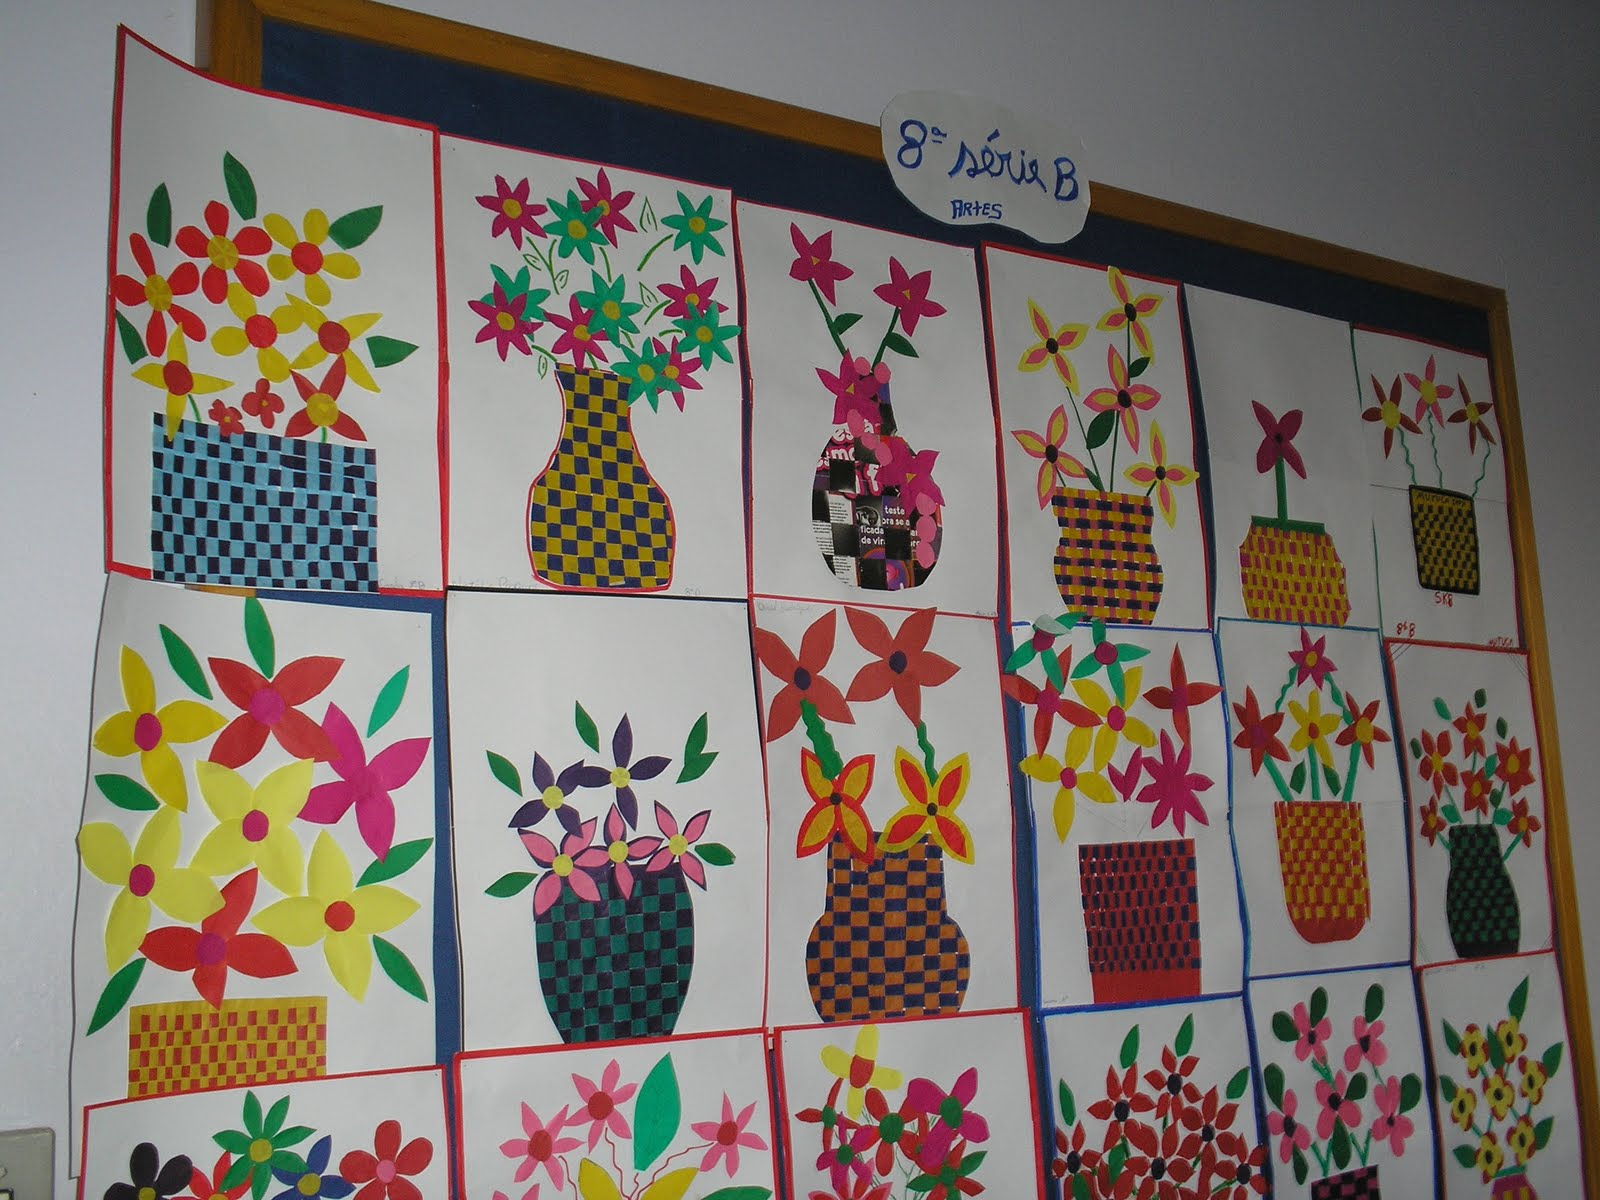 Escola Estadual de Ensino Fundamental Severino Dalzotto Trabalho de artes dos alunos da 8 u00aa